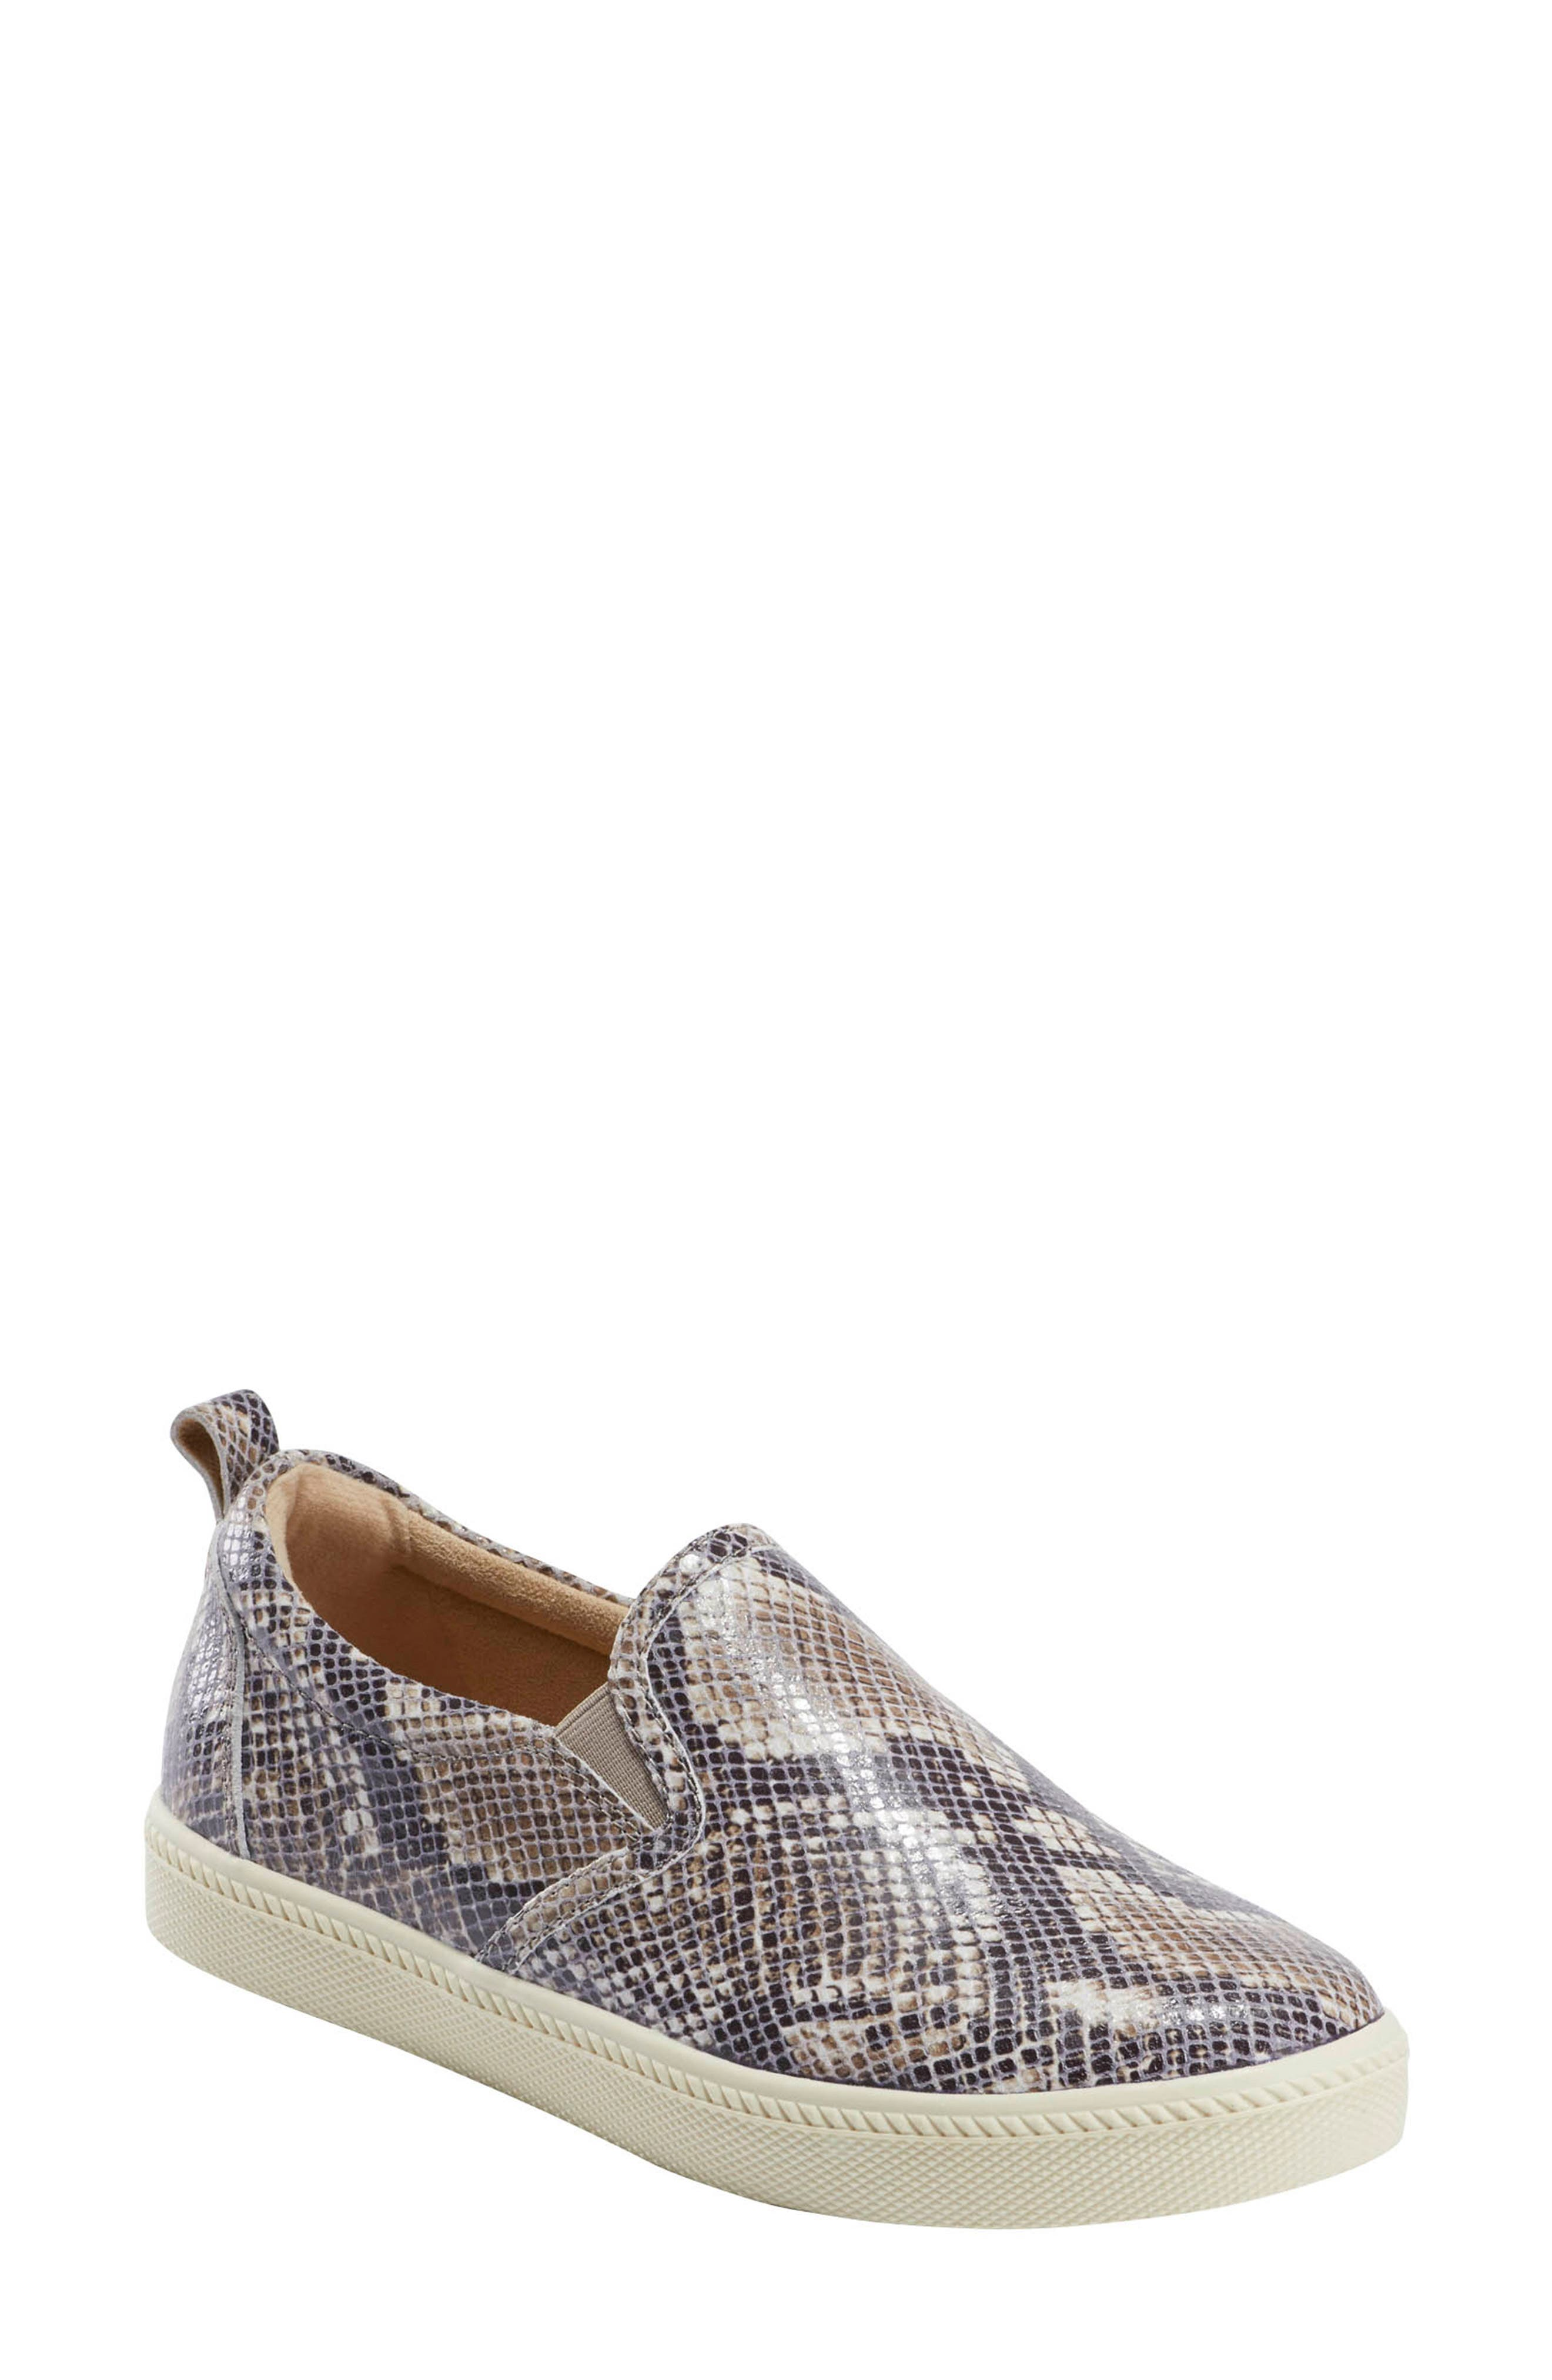 Sneakers \u0026 Athletic Shoes